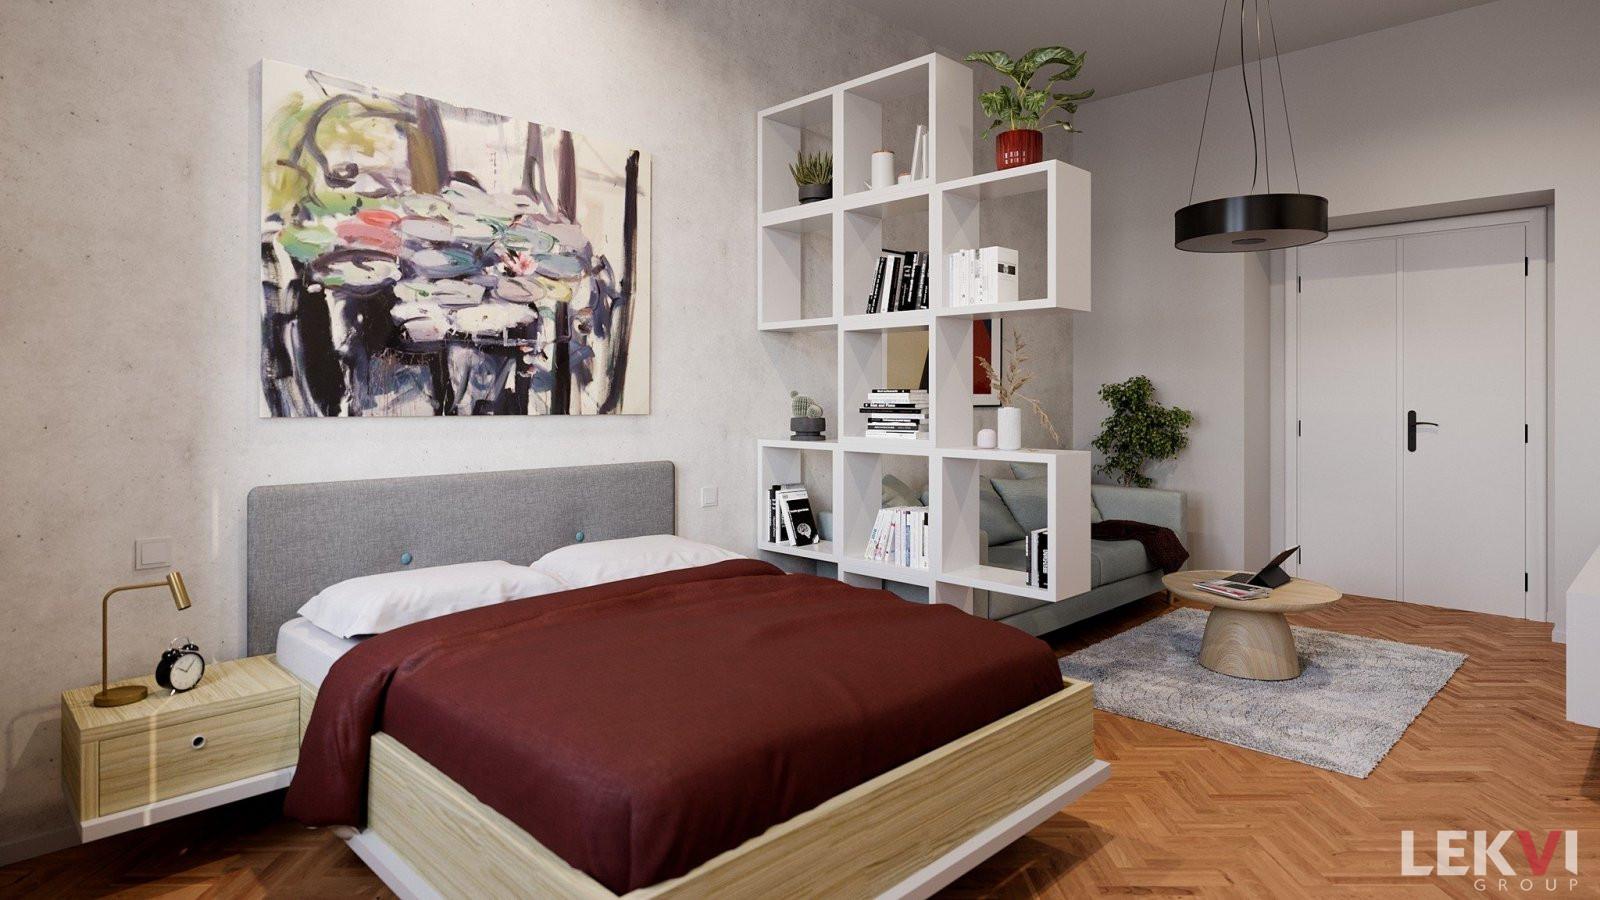 Prodej bytu 2+1, 60 m2 - Sokolovská, Praha 8